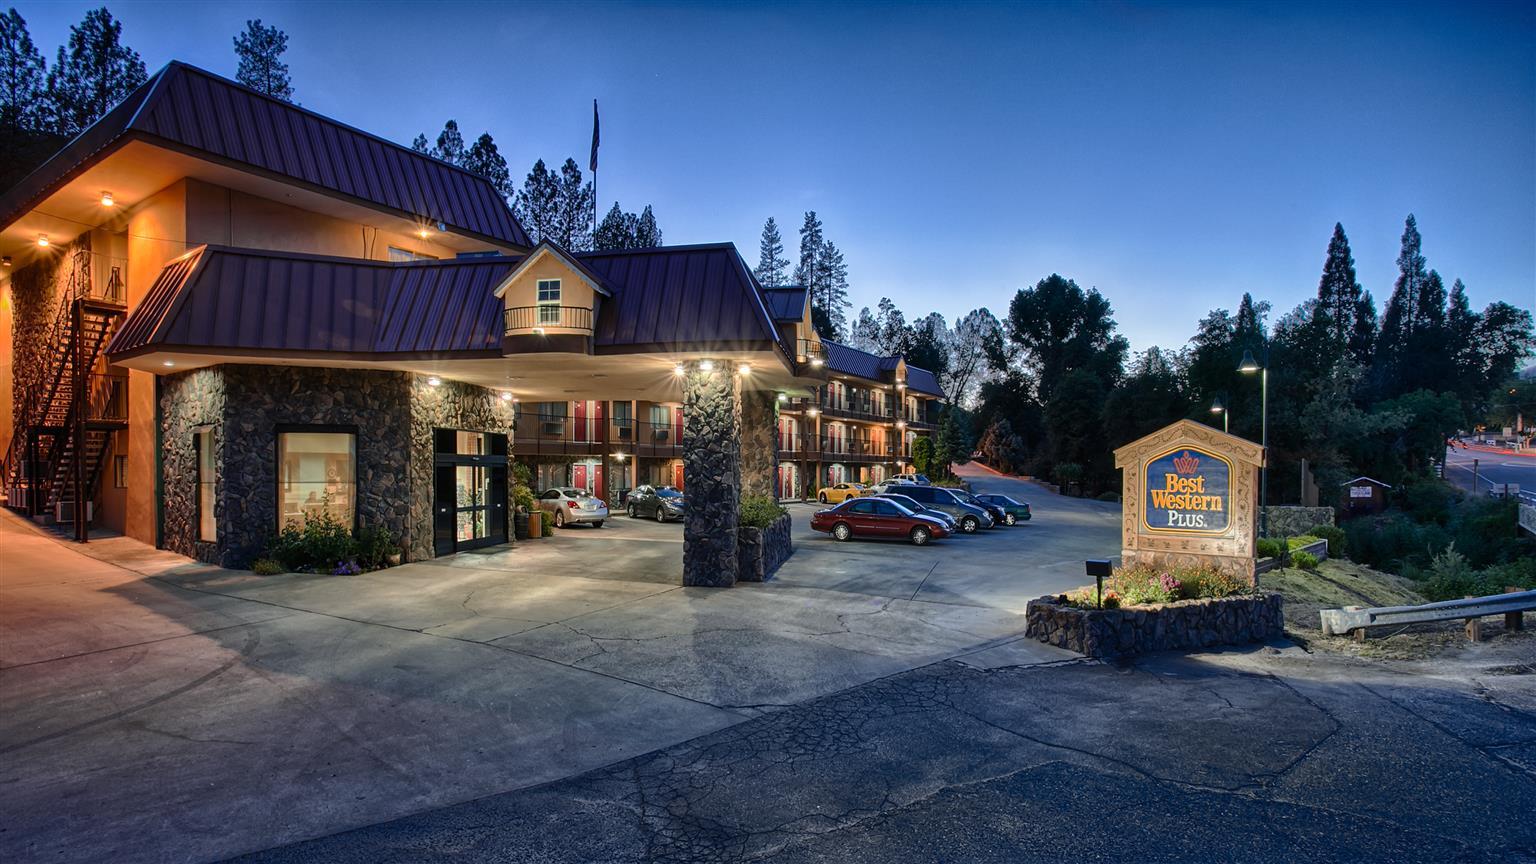 Hotel Rooms In Oakhurst Ca